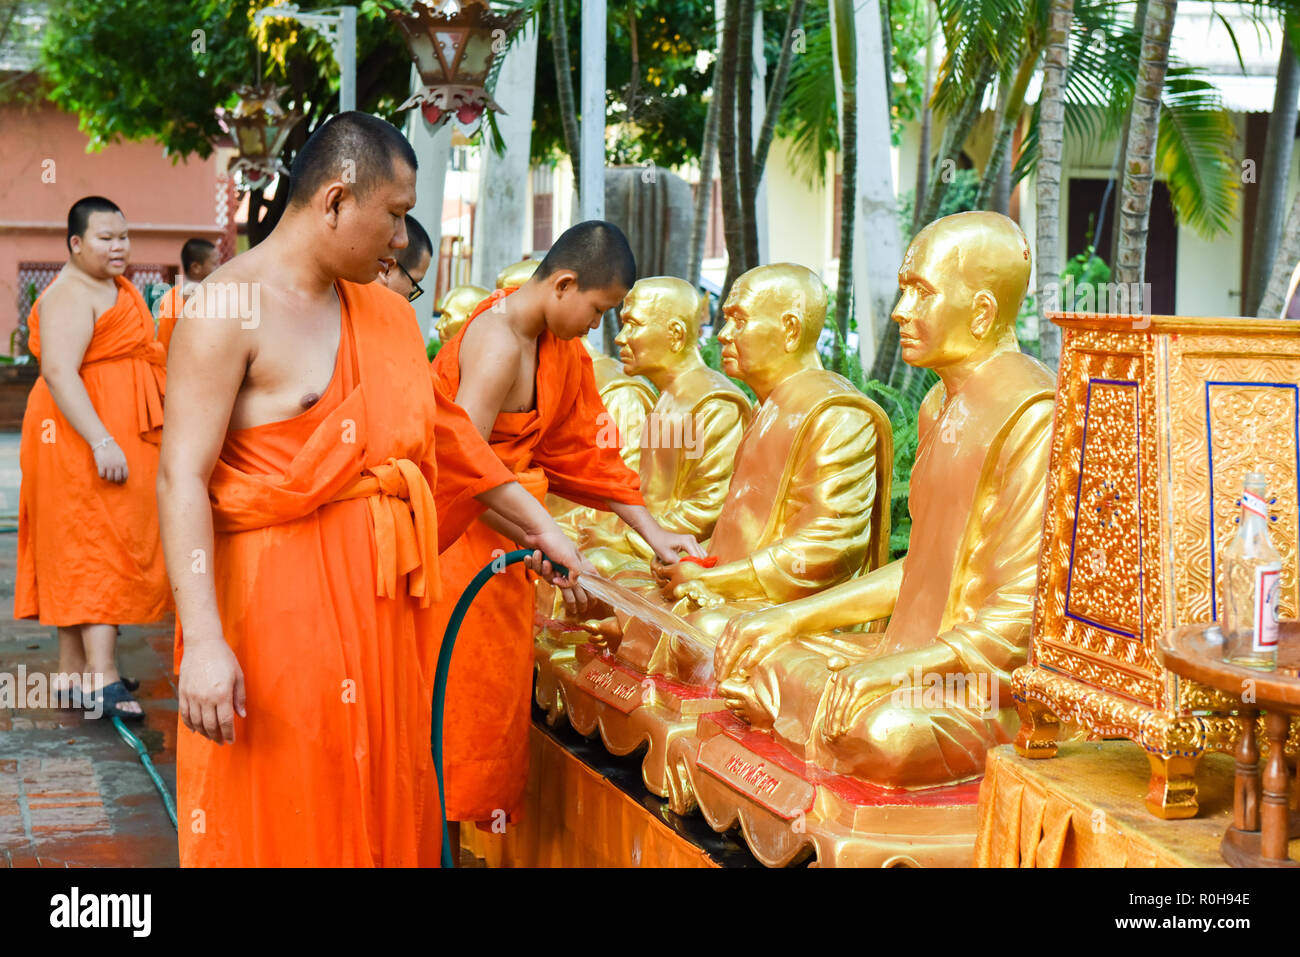 Los monjes , Chiang Mai, Tailandia Imagen De Stock